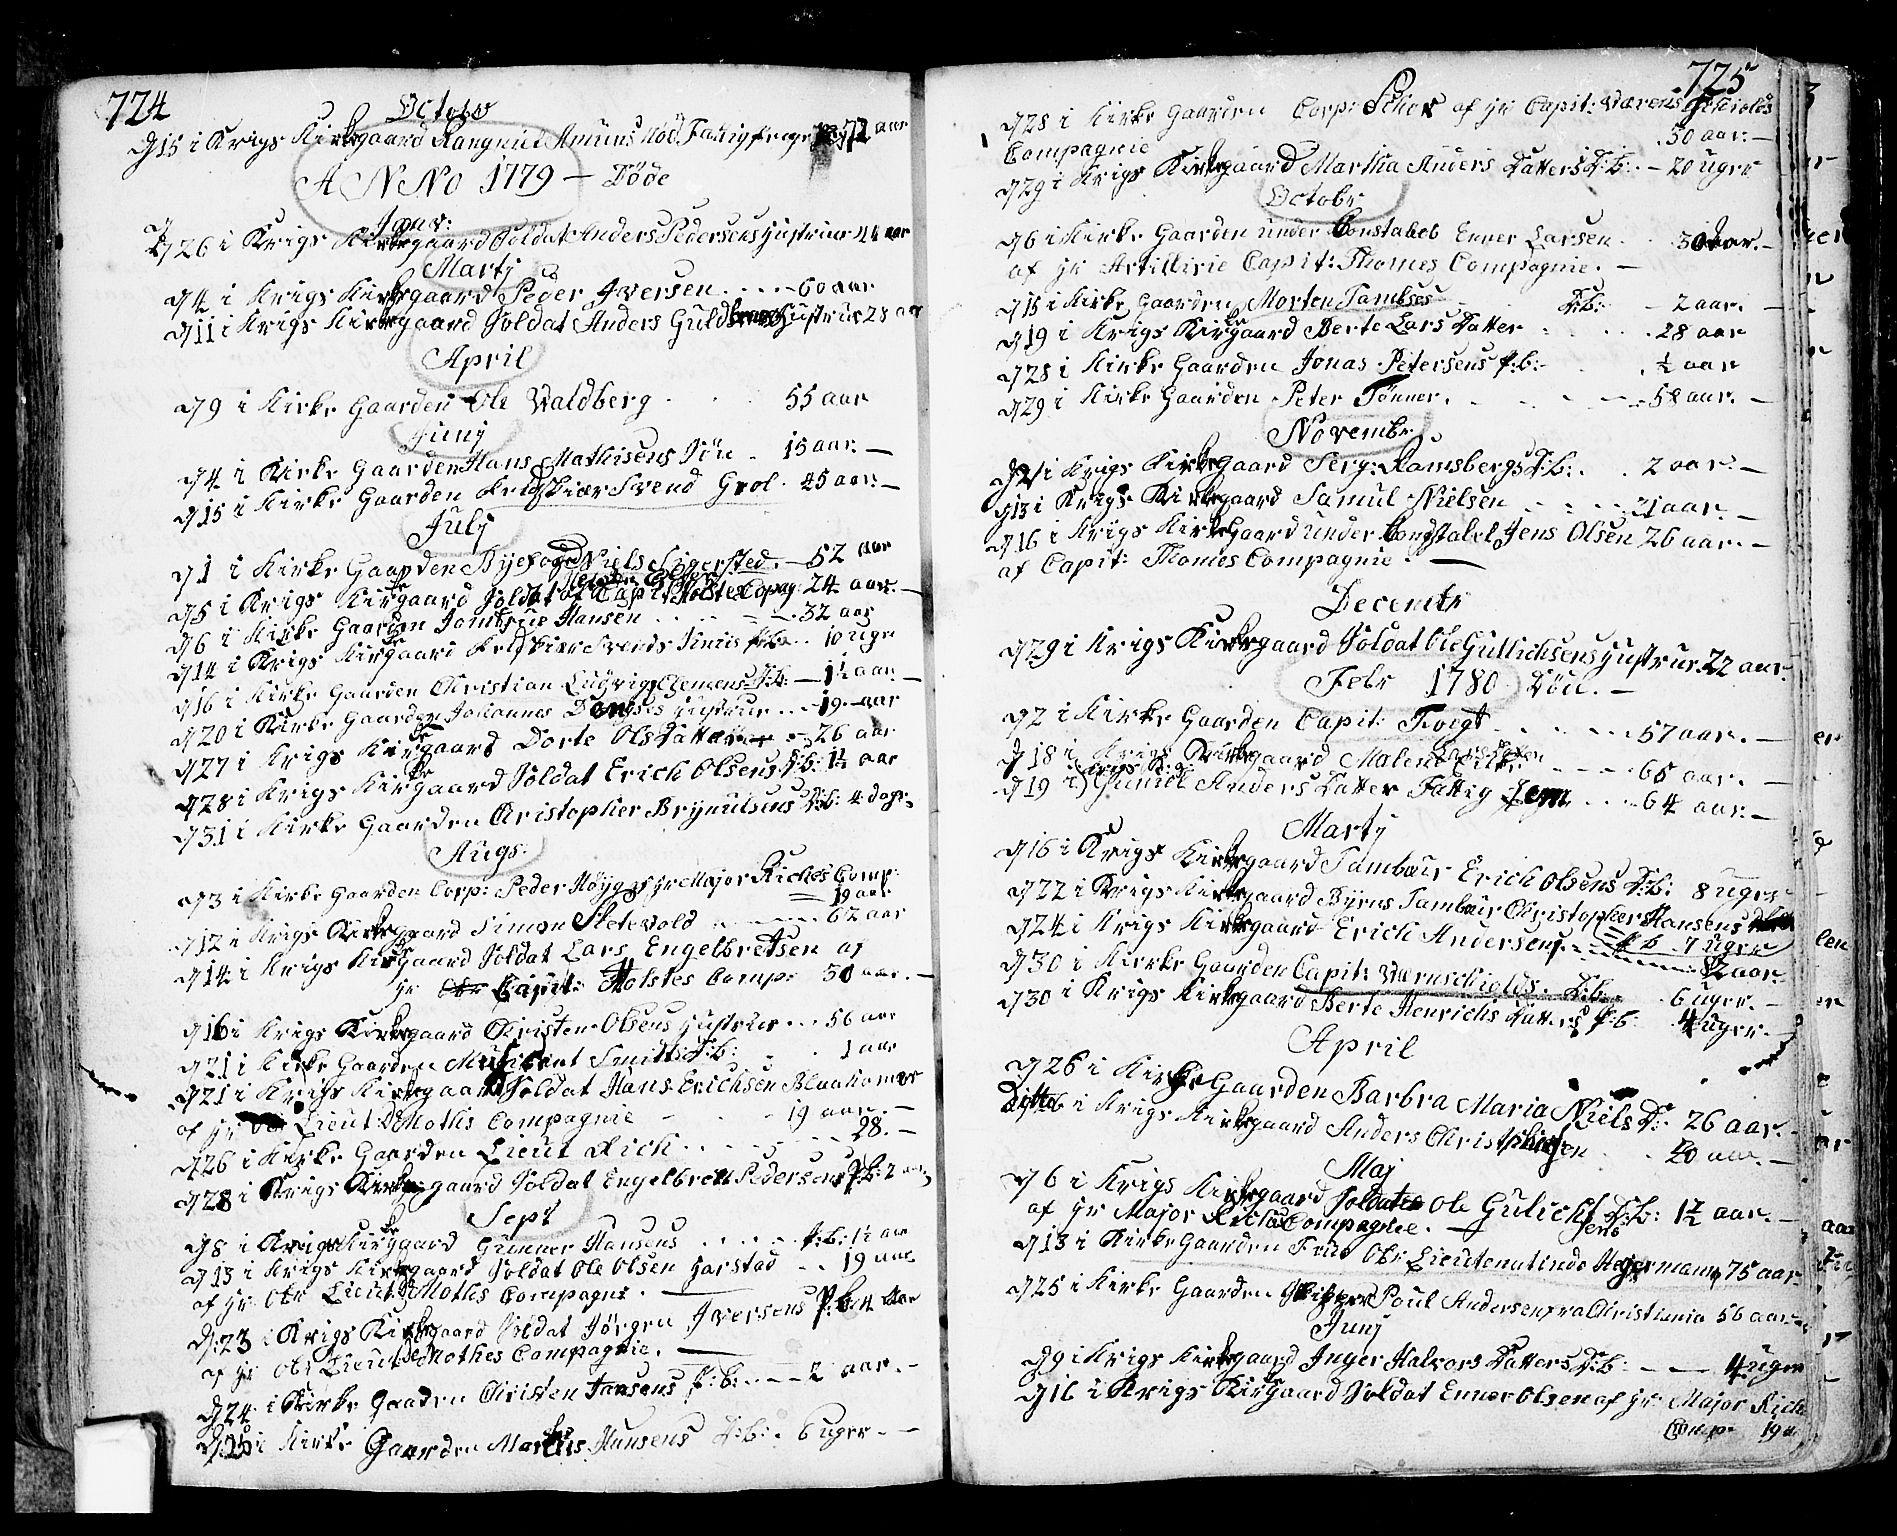 SAO, Fredrikstad prestekontor Kirkebøker, F/Fa/L0002: Ministerialbok nr. 2, 1750-1804, s. 724-725